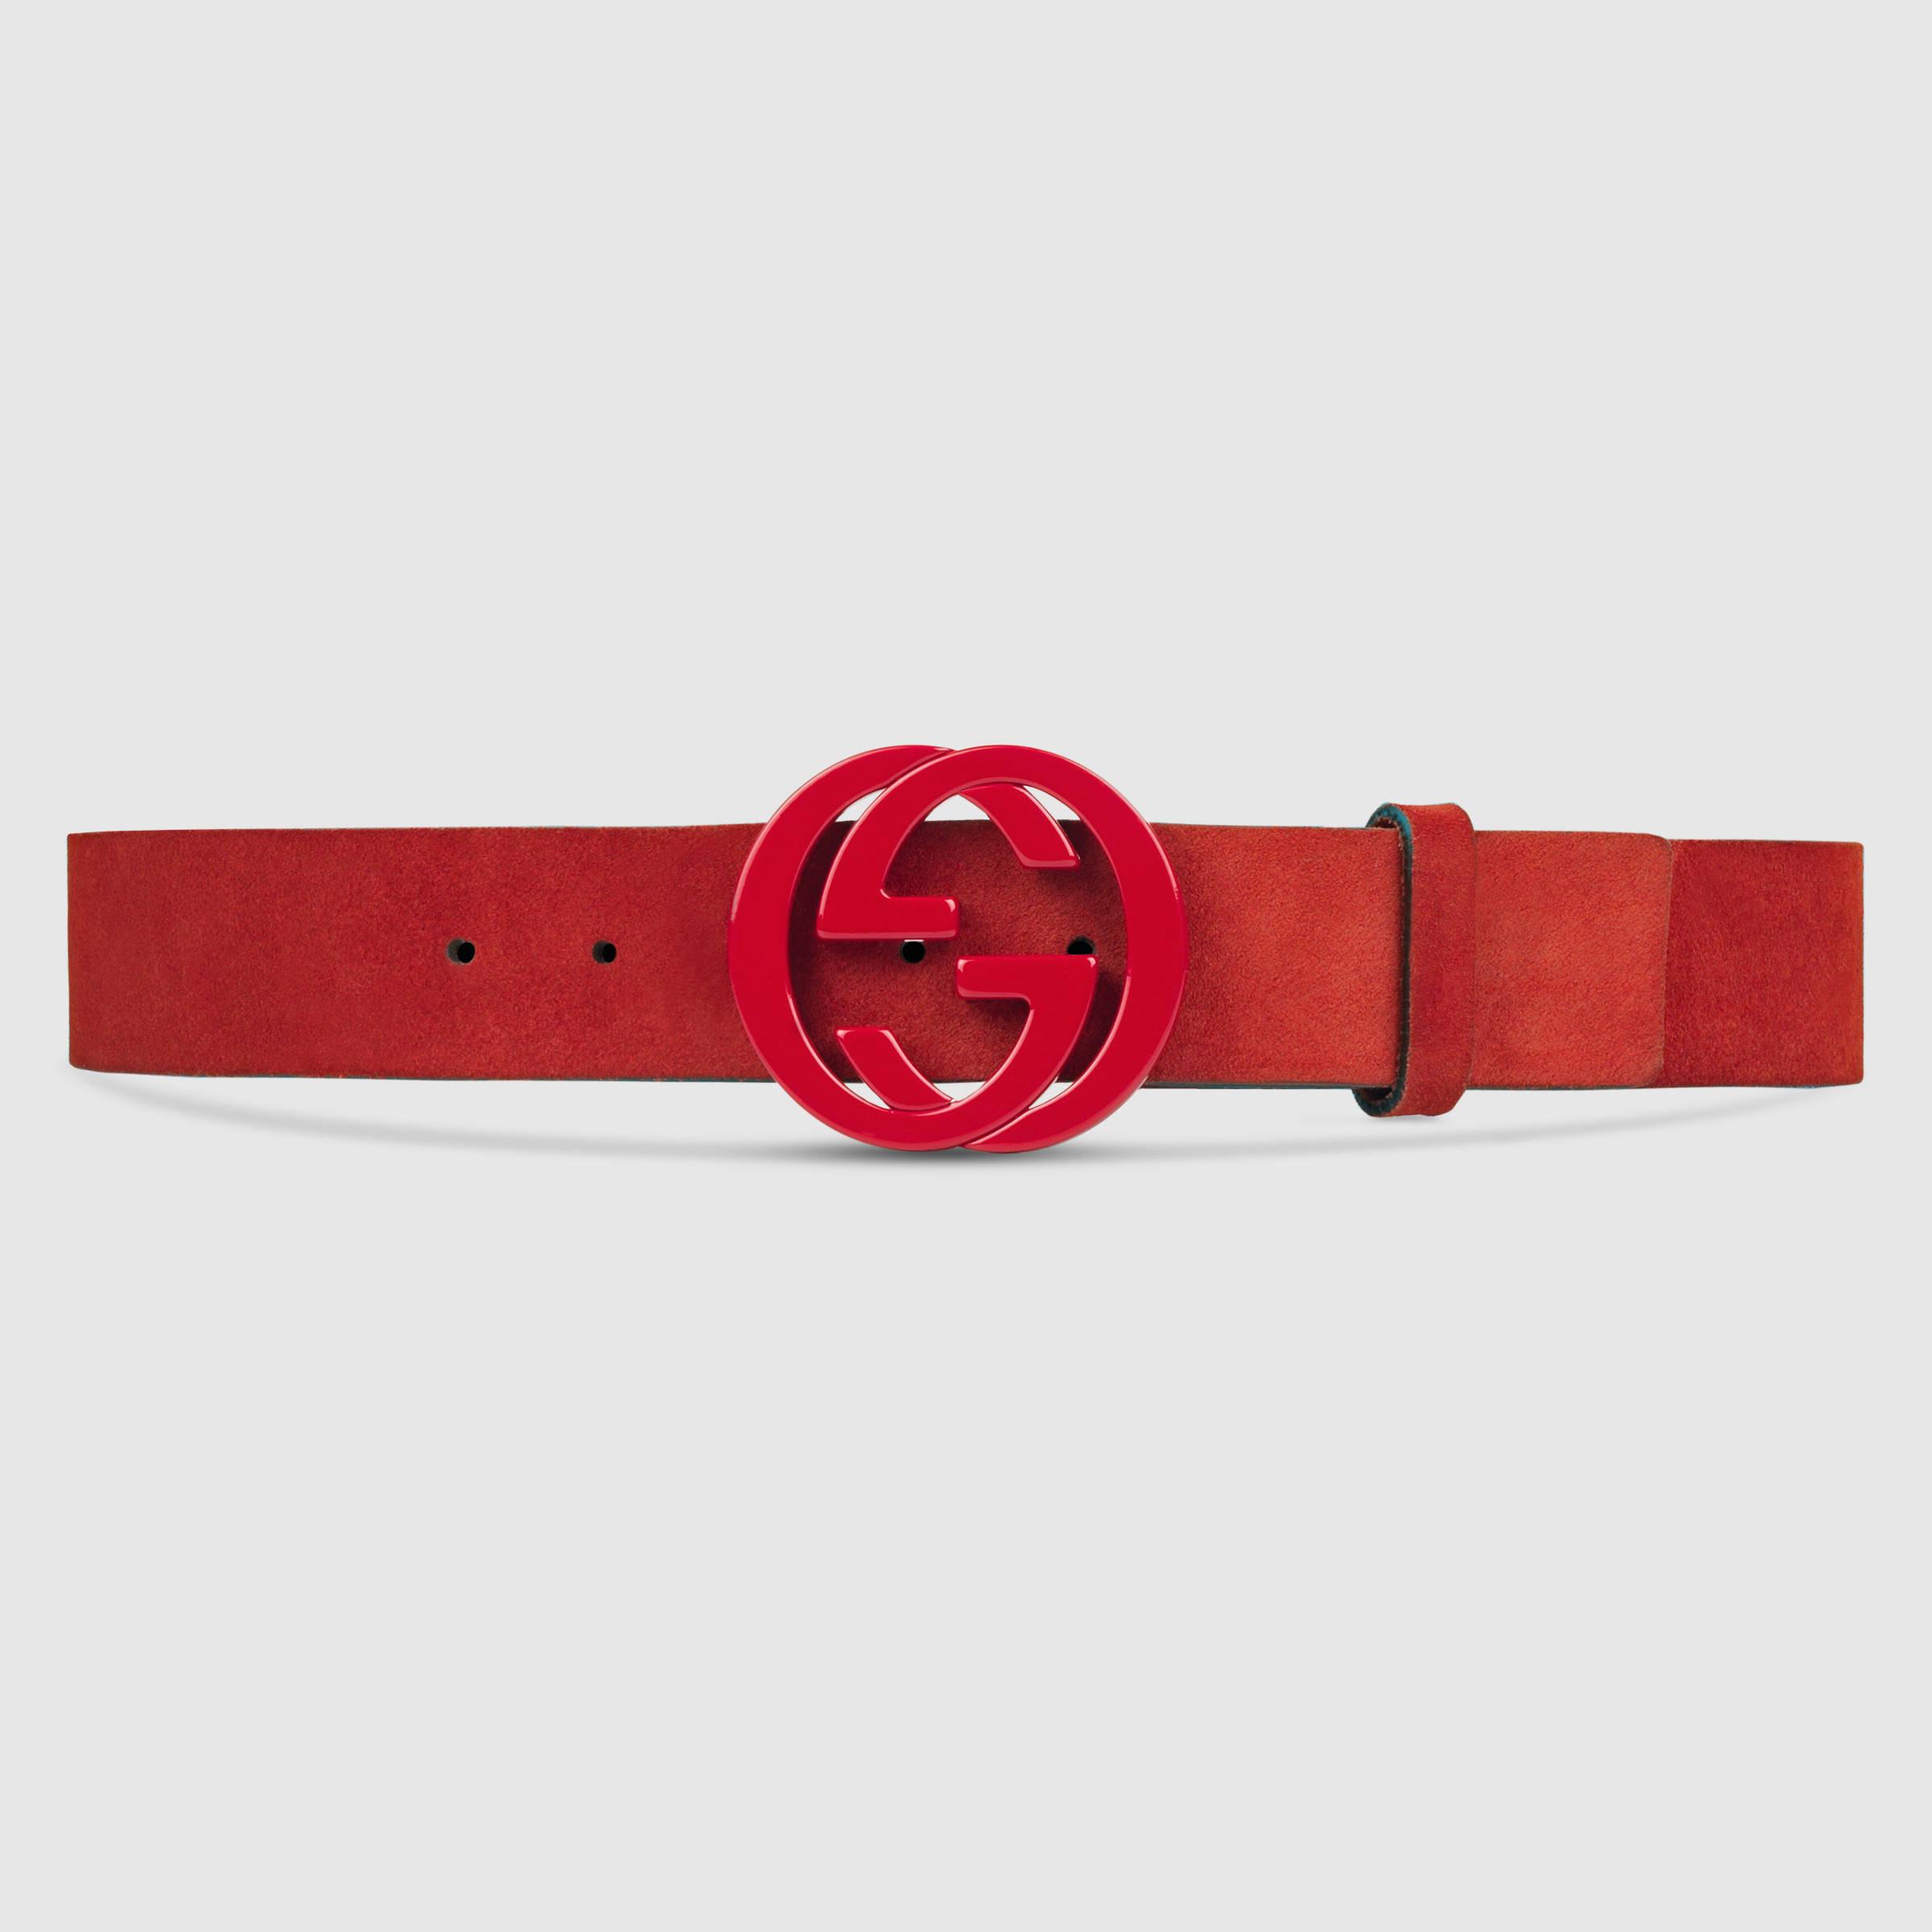 Gucci Belt Red and Black | Red Gucci Belt | Loui Vuitton Belt